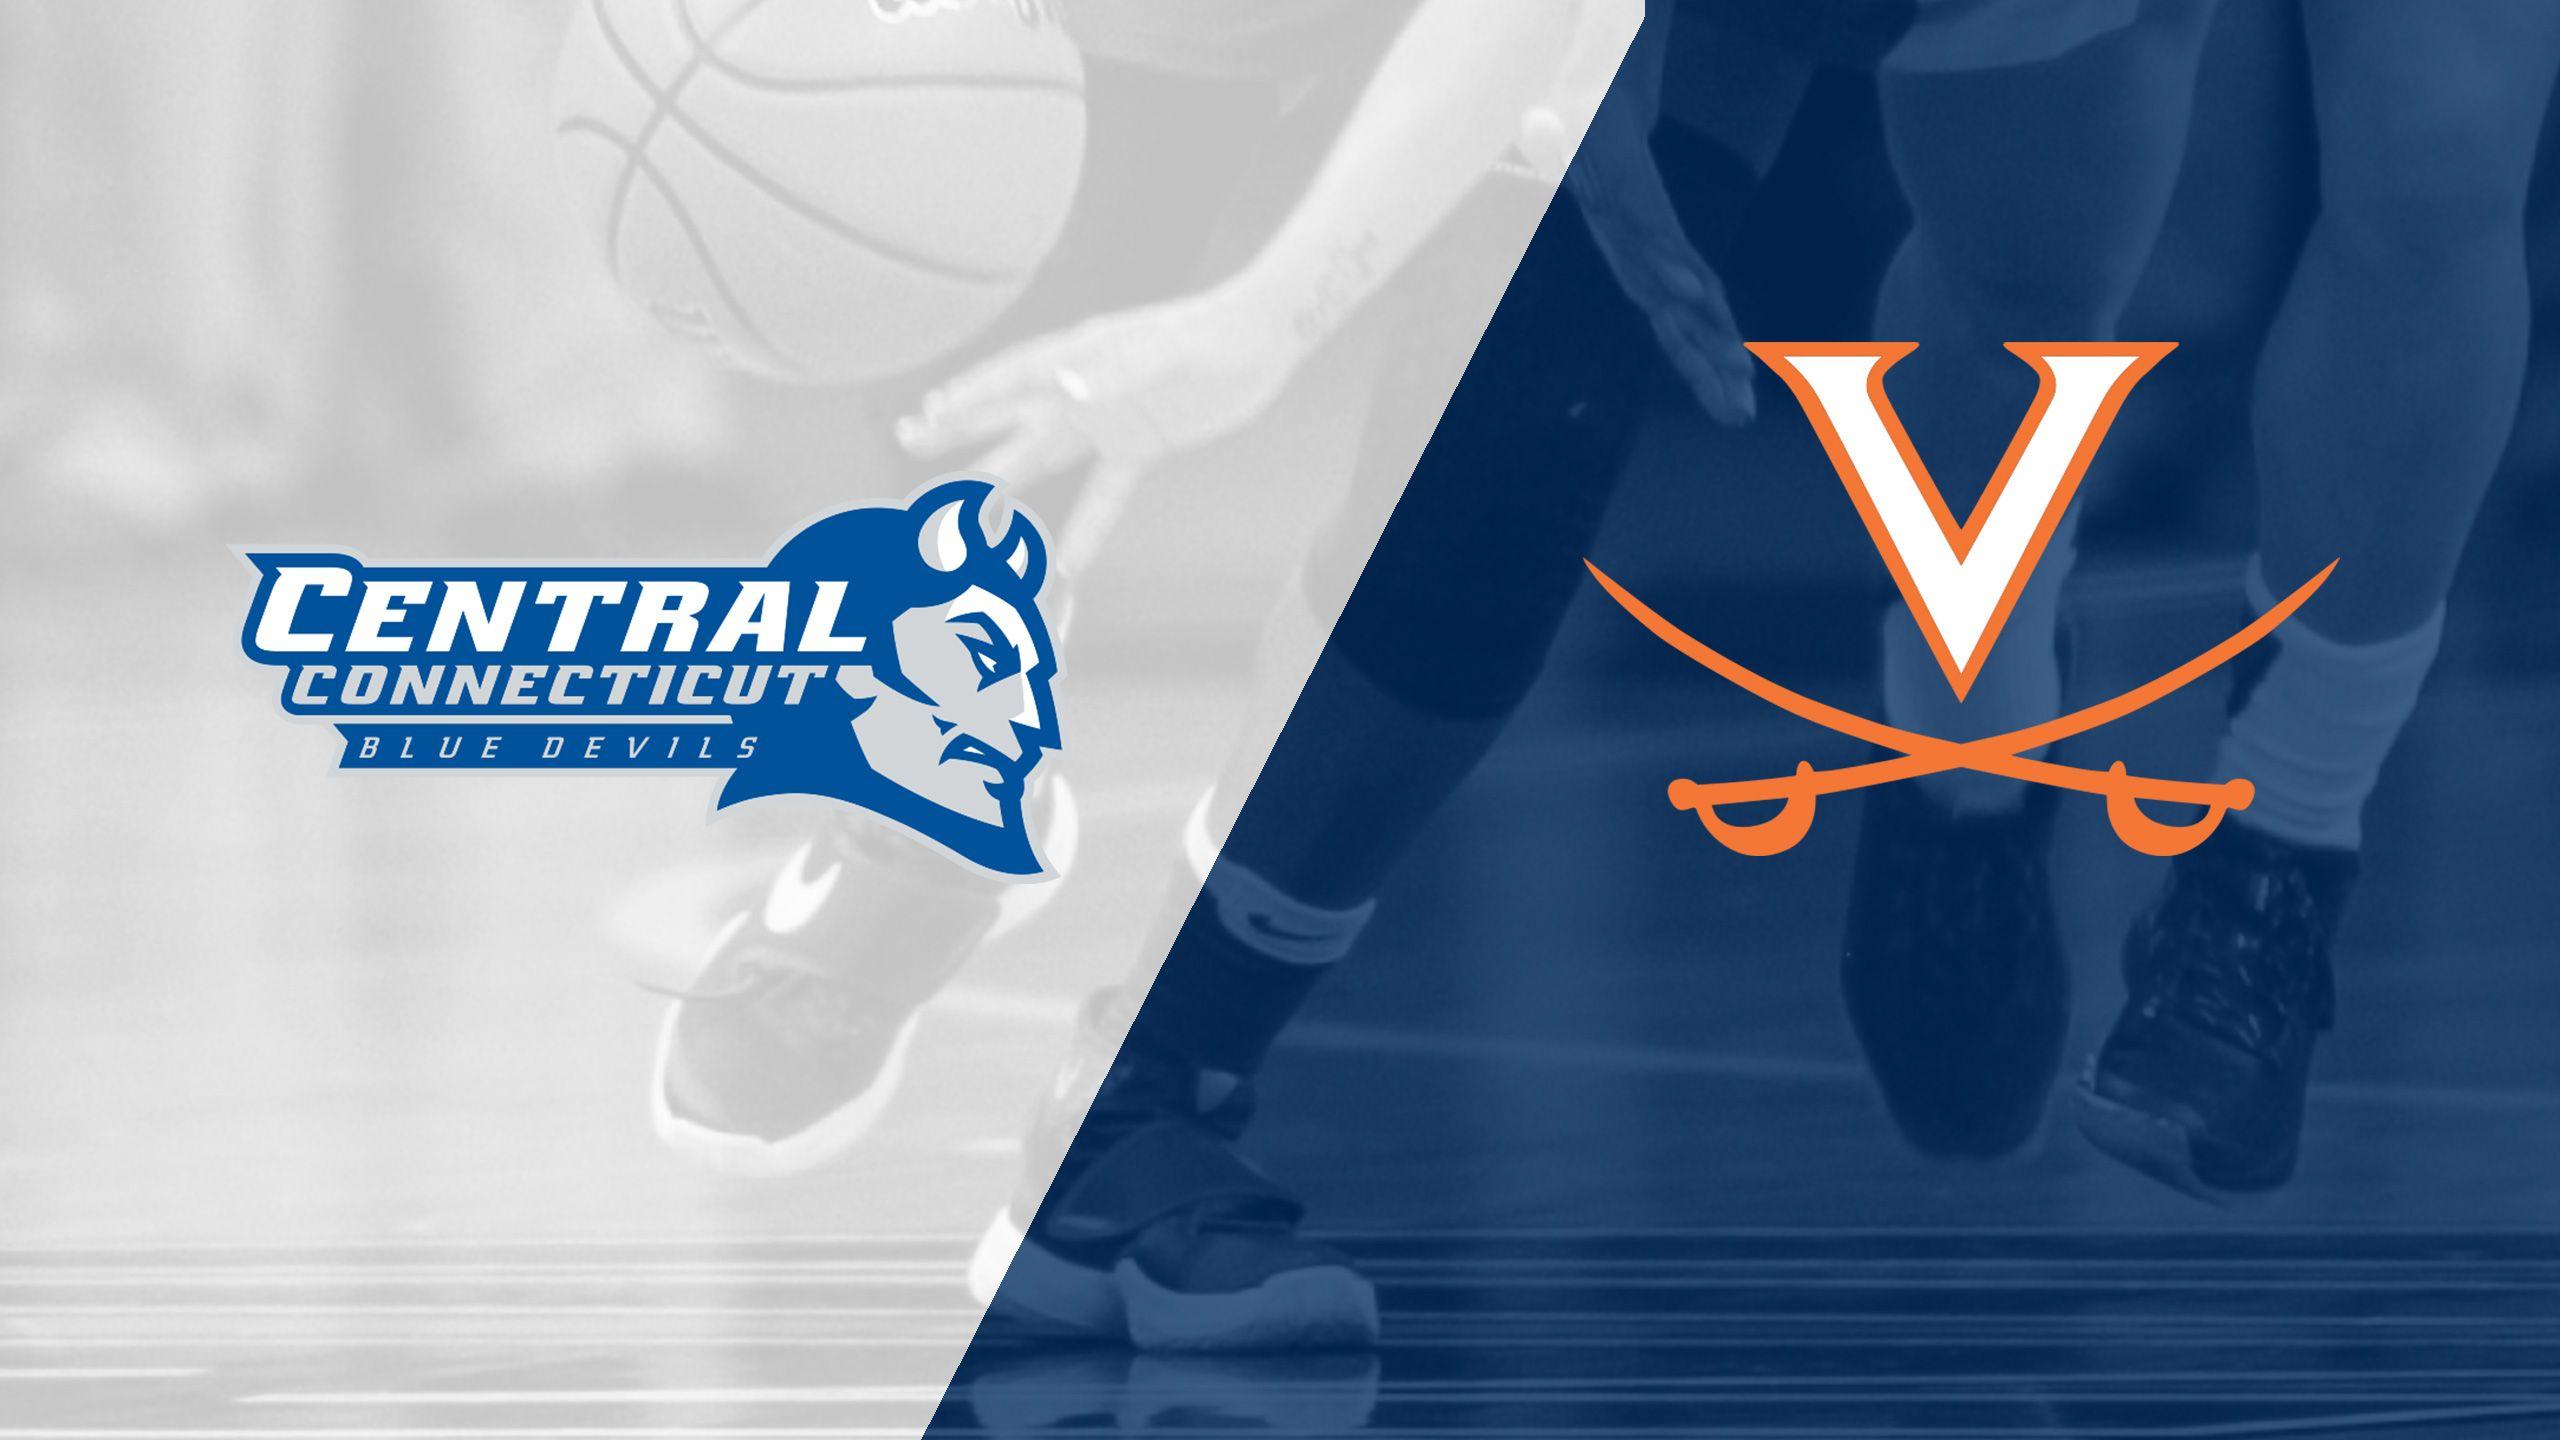 Central Connecticut vs. Virginia (W Basketball)